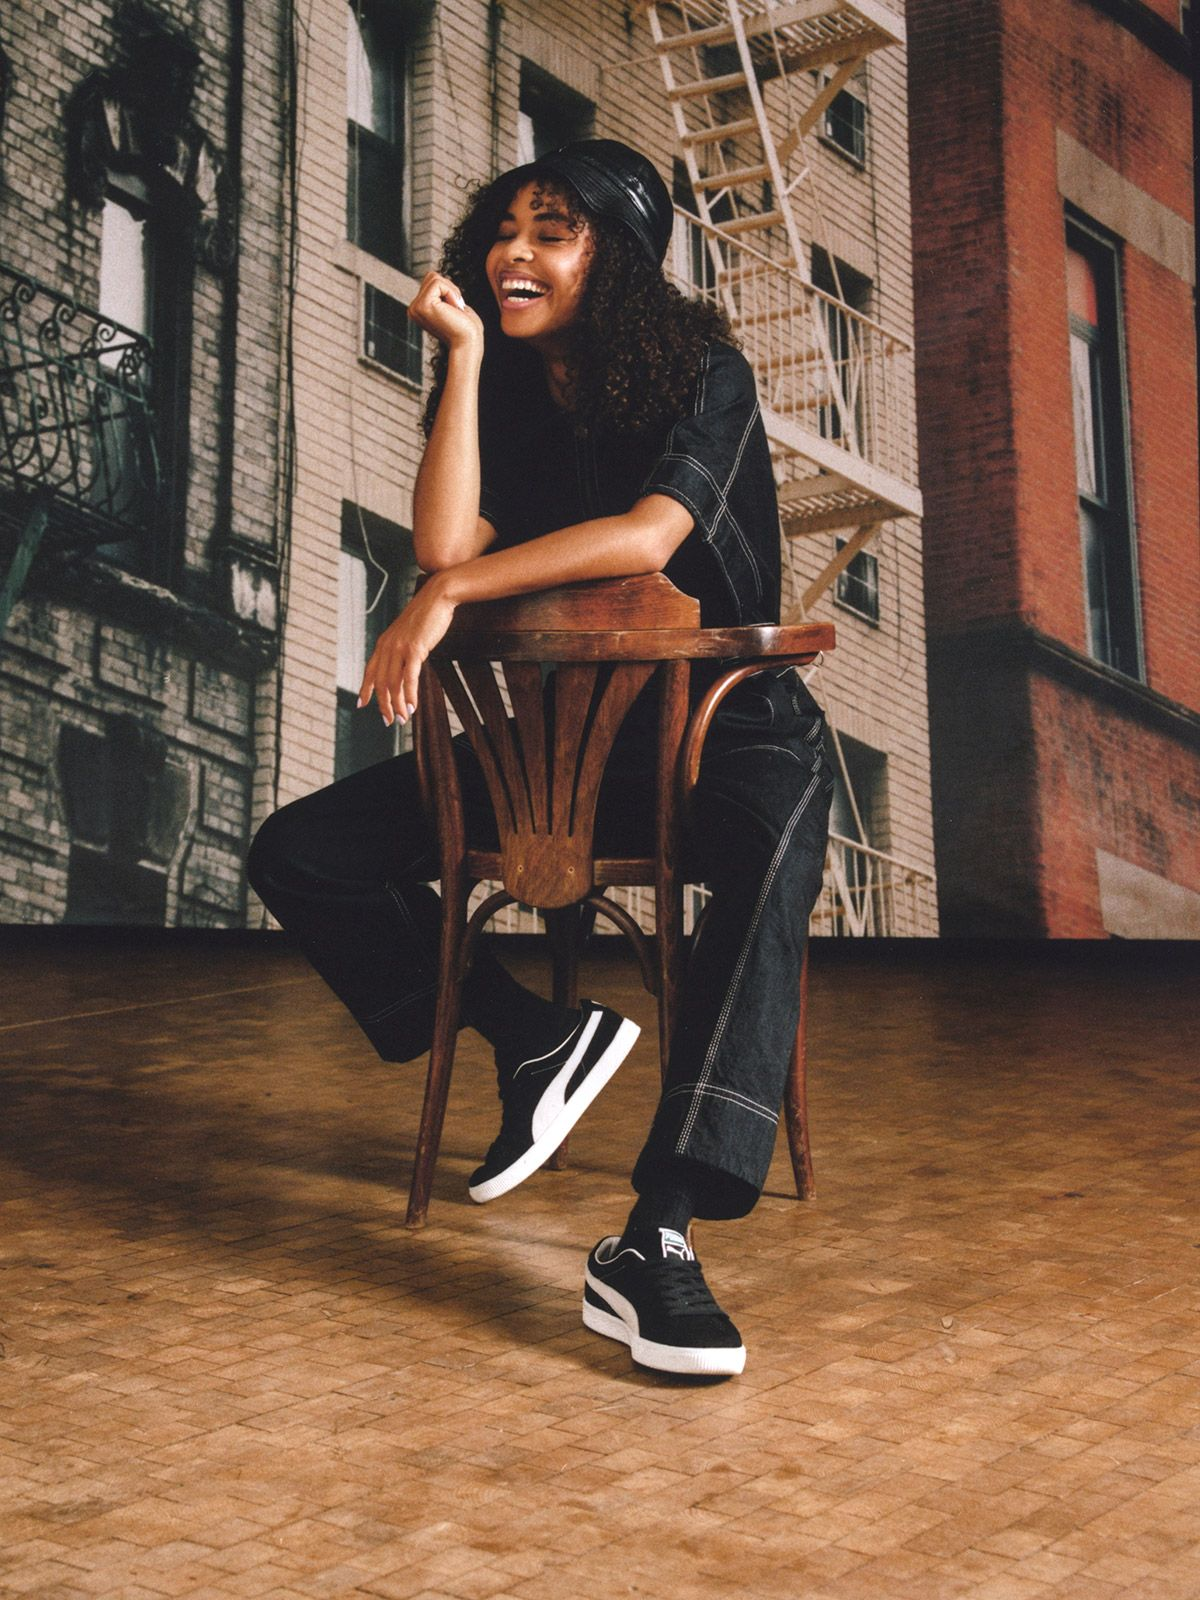 Meet June Ambrose, the Genius Behind the Craziest '90s Hip-Hop Fits 20